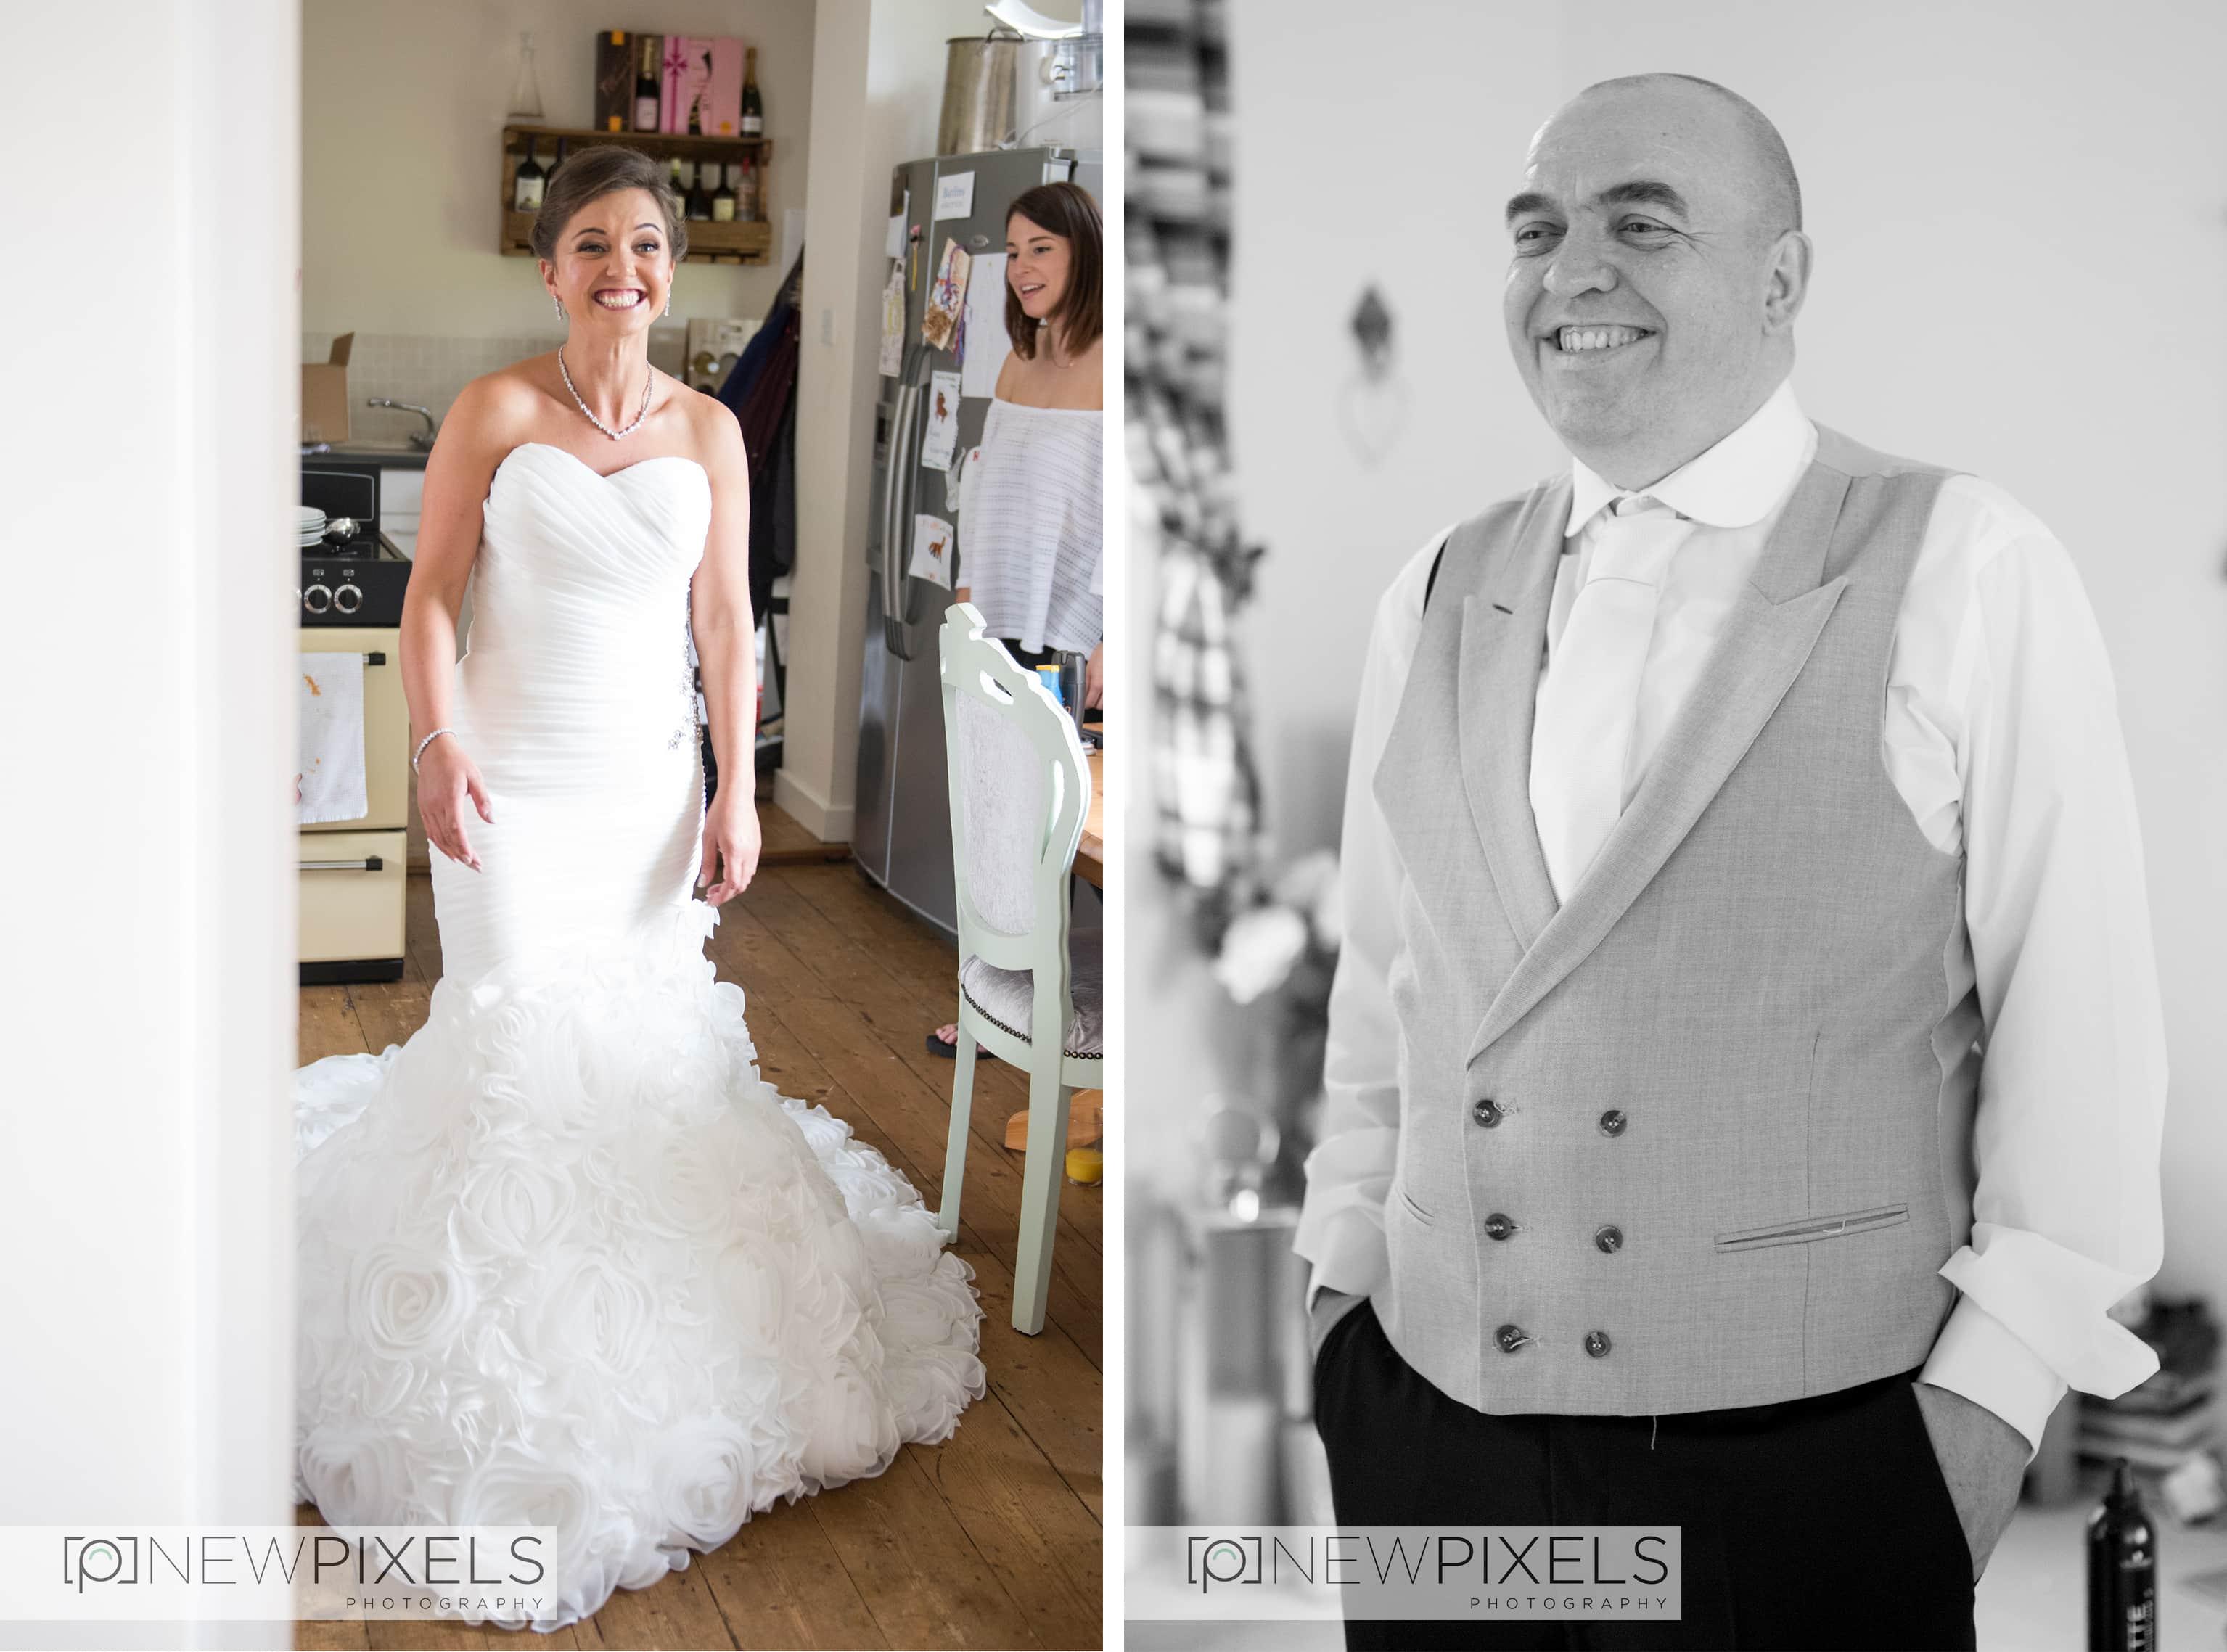 hertfordshire wedding photography10